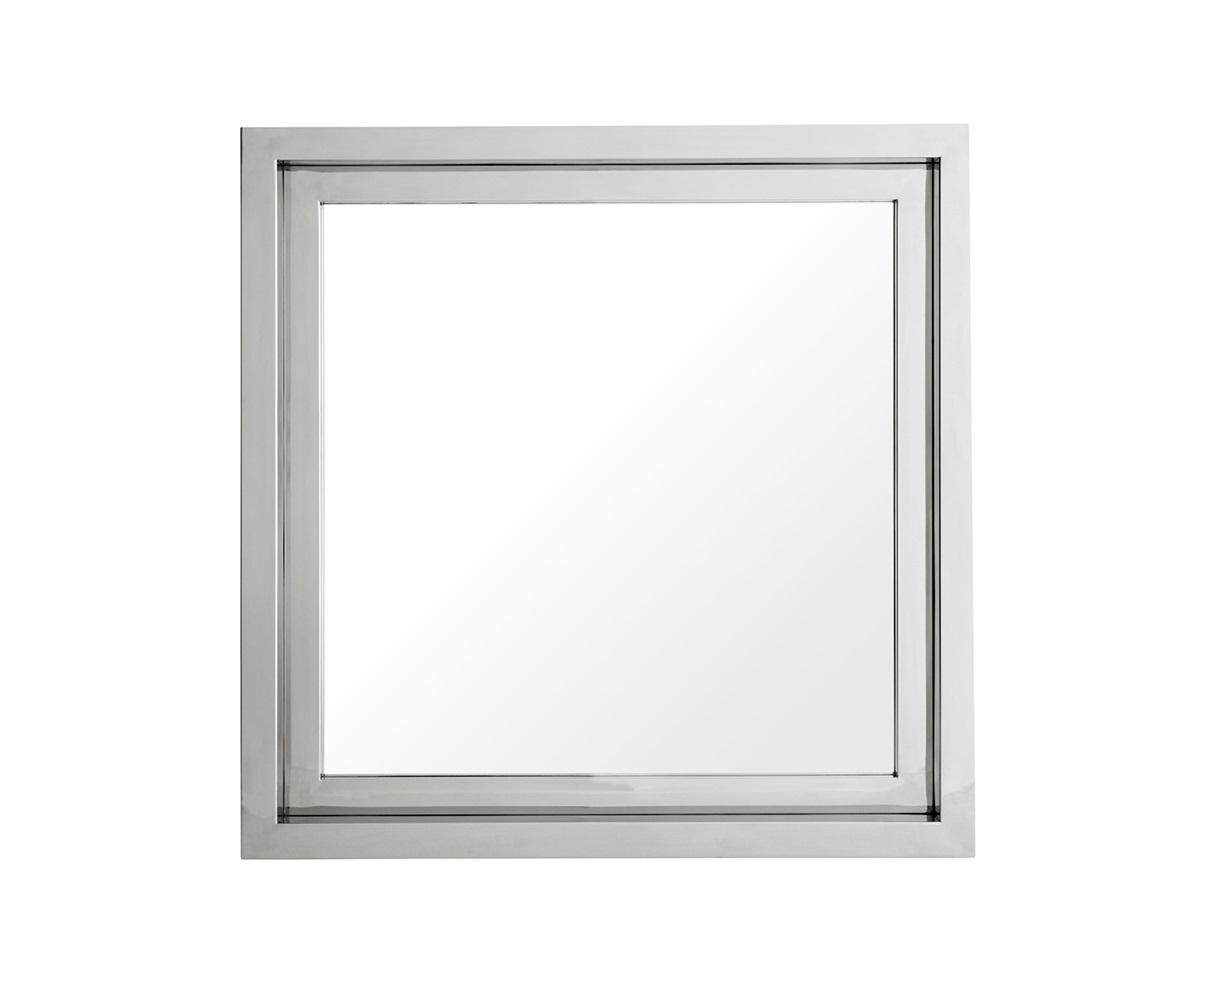 ЗеркалоНастенные зеркала<br>Зеркало Mirror Moore в раме из полированной нержавеющей стали.<br><br>Material: Сталь<br>Width см: 100<br>Height см: 100